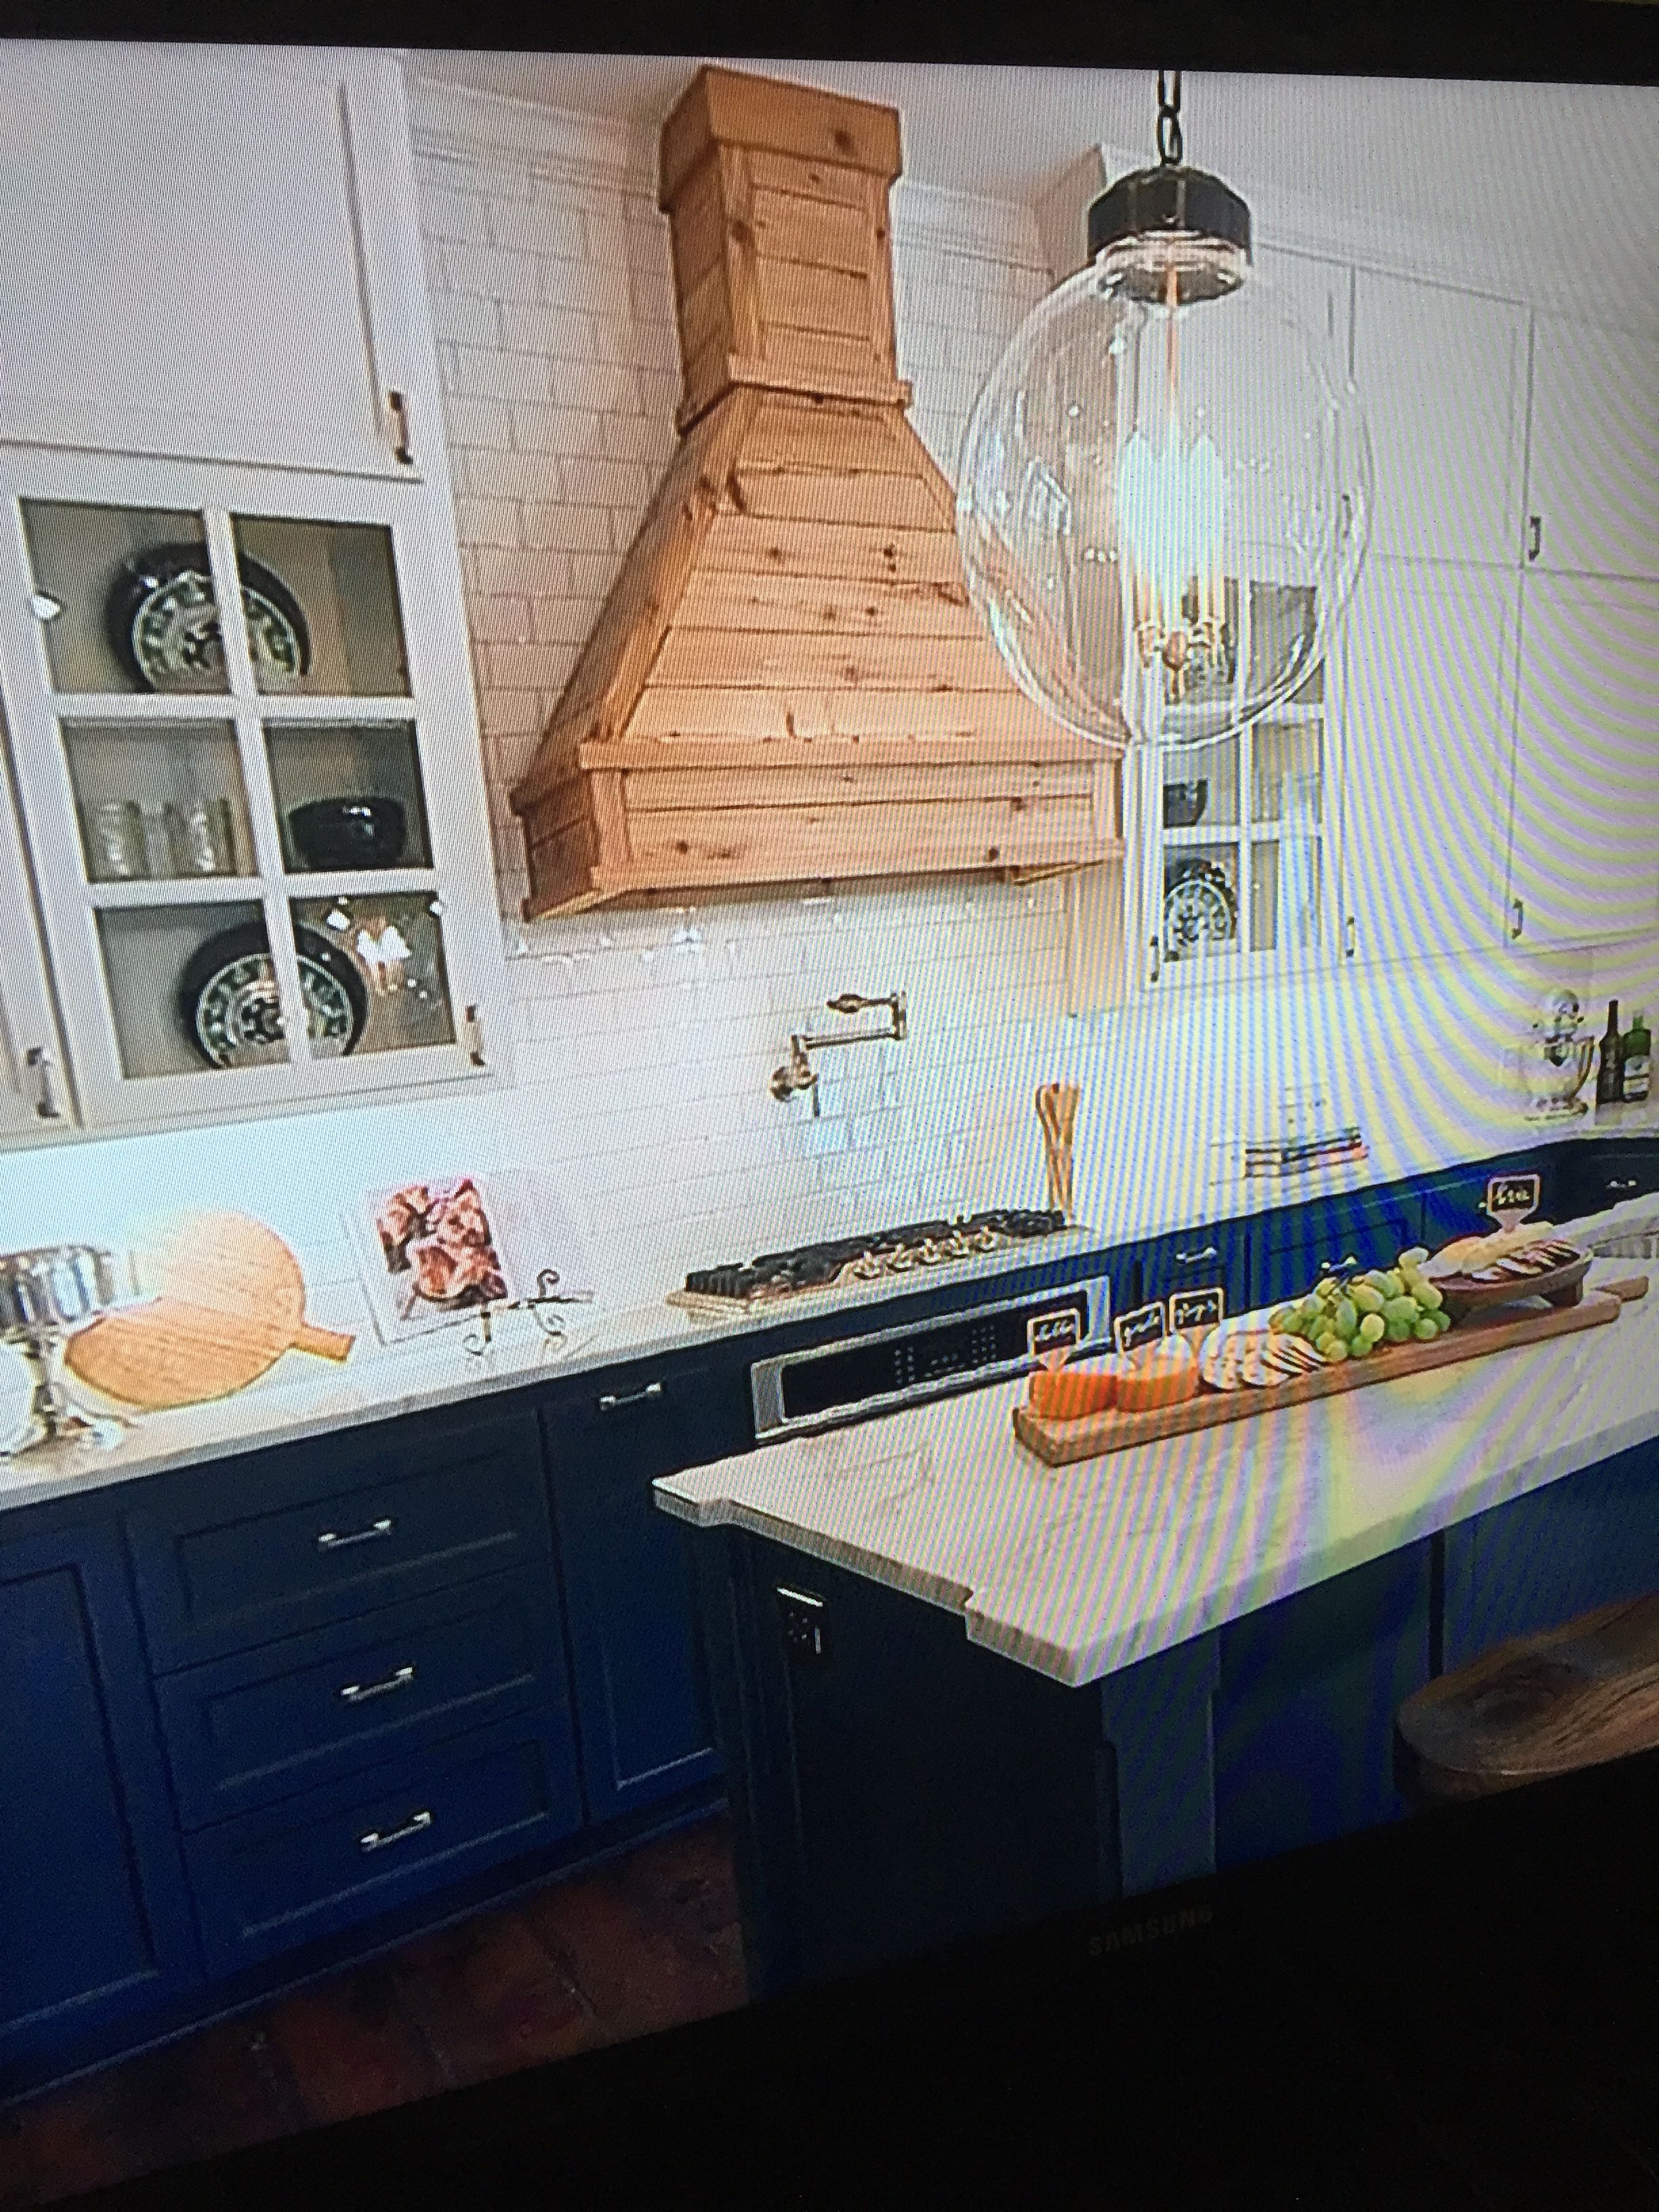 natural wood vent hood hgtv texas kitchen kitchen cabinets natural wood on outdoor kitchen vent hood ideas id=27852